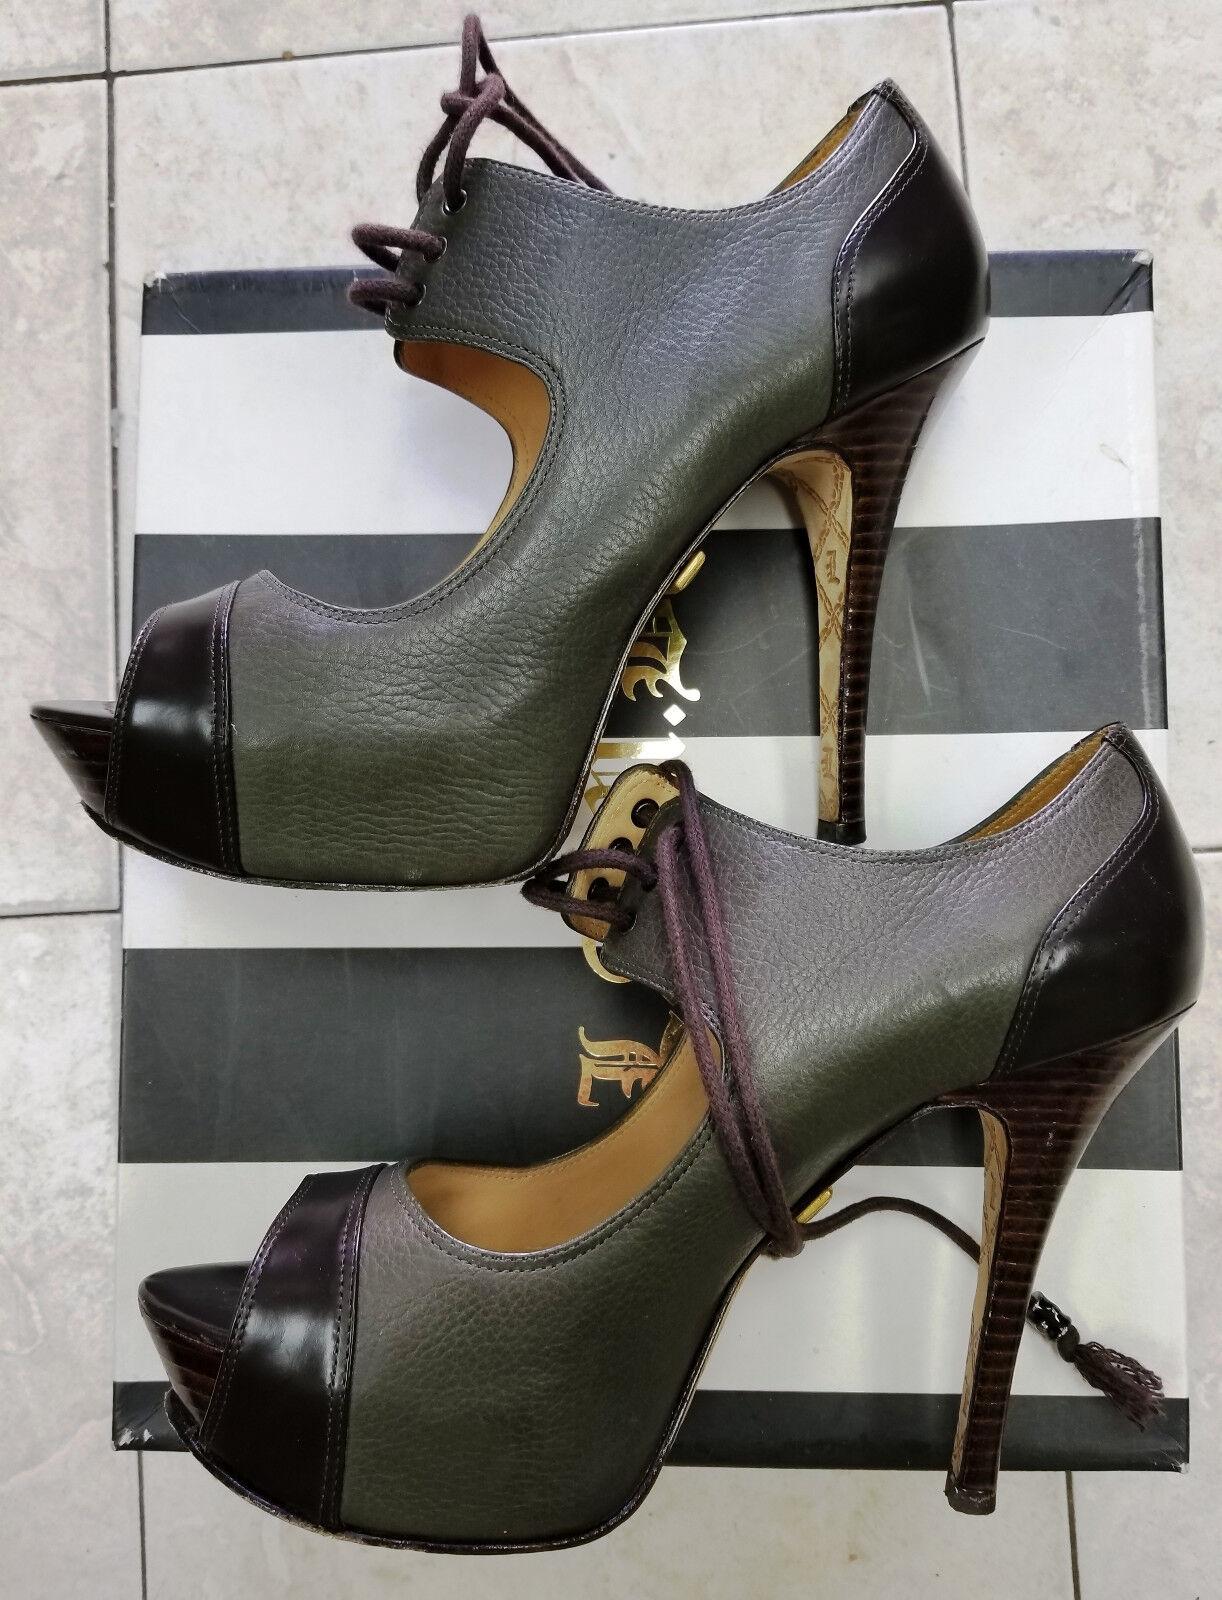 L.A.M.B. Lace Up Olive Leather Peep Toe Platform Stiletto Heels Dimensione 71 2 B